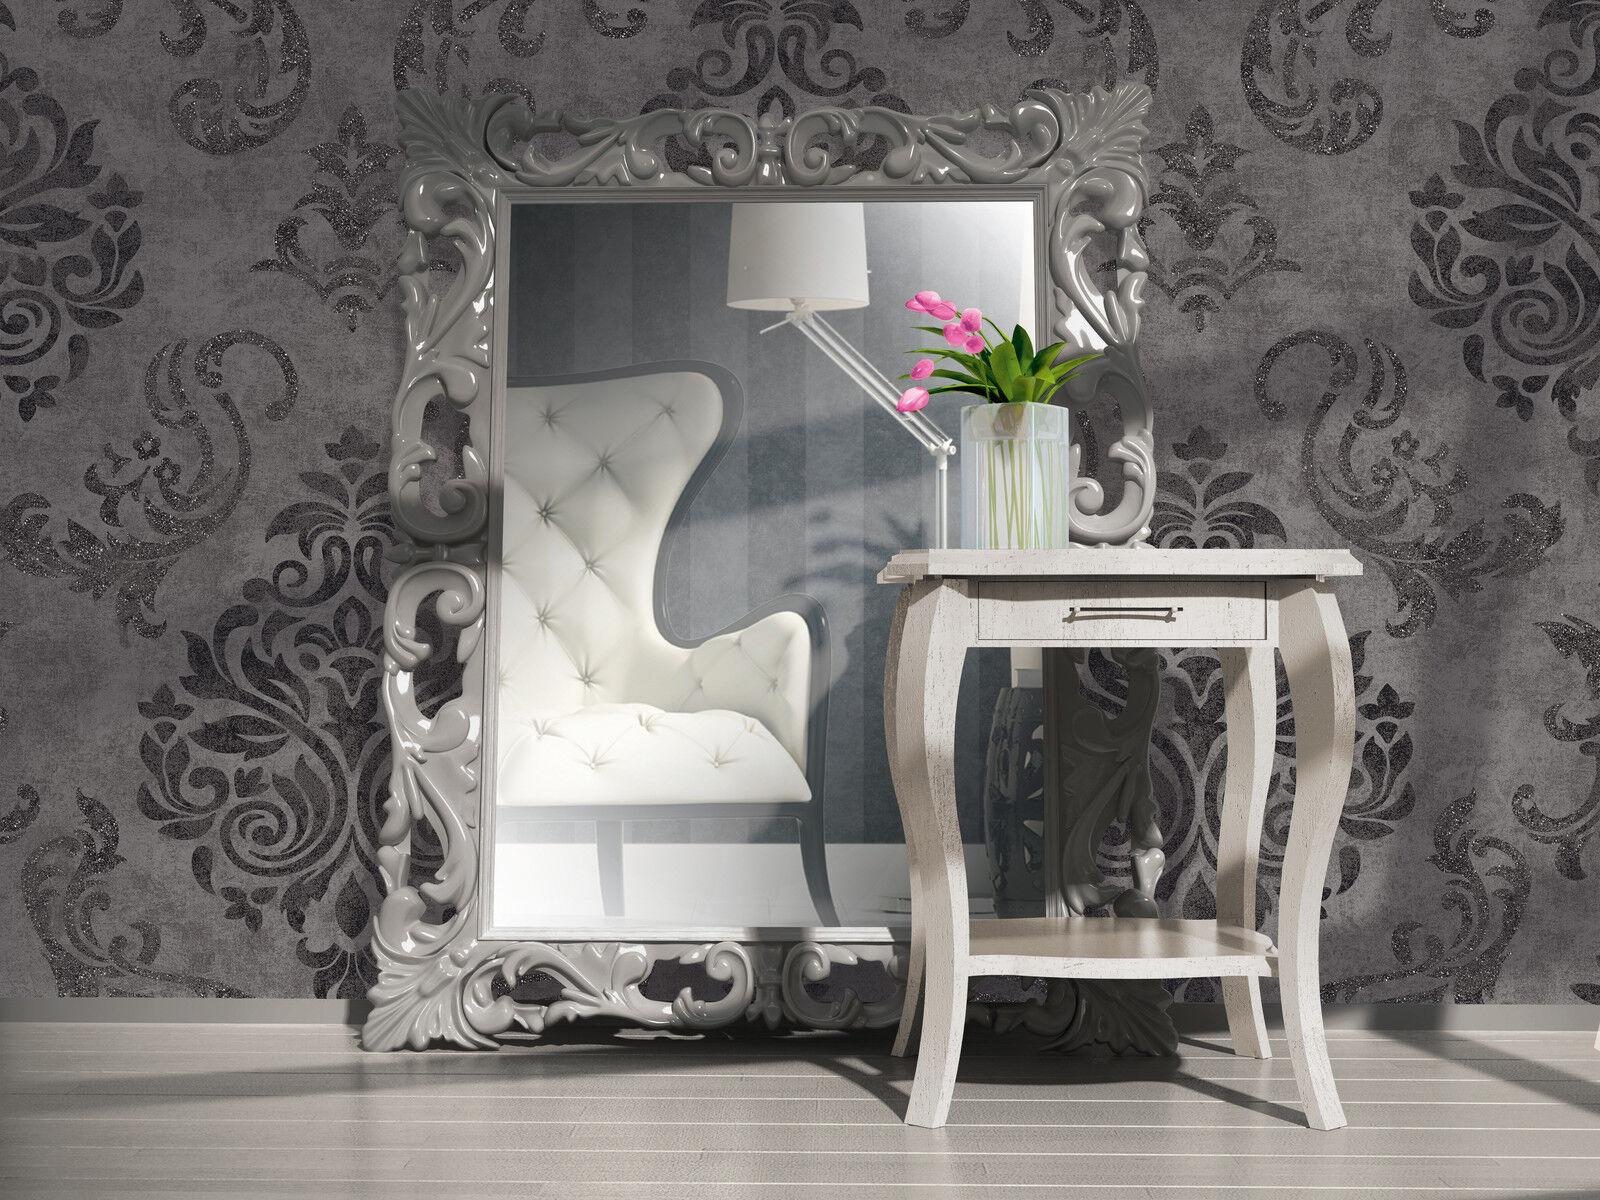 Wundervoll Vlies Tapete Barock Muster Ornament anthrazit grau silber glitzer  GQ04